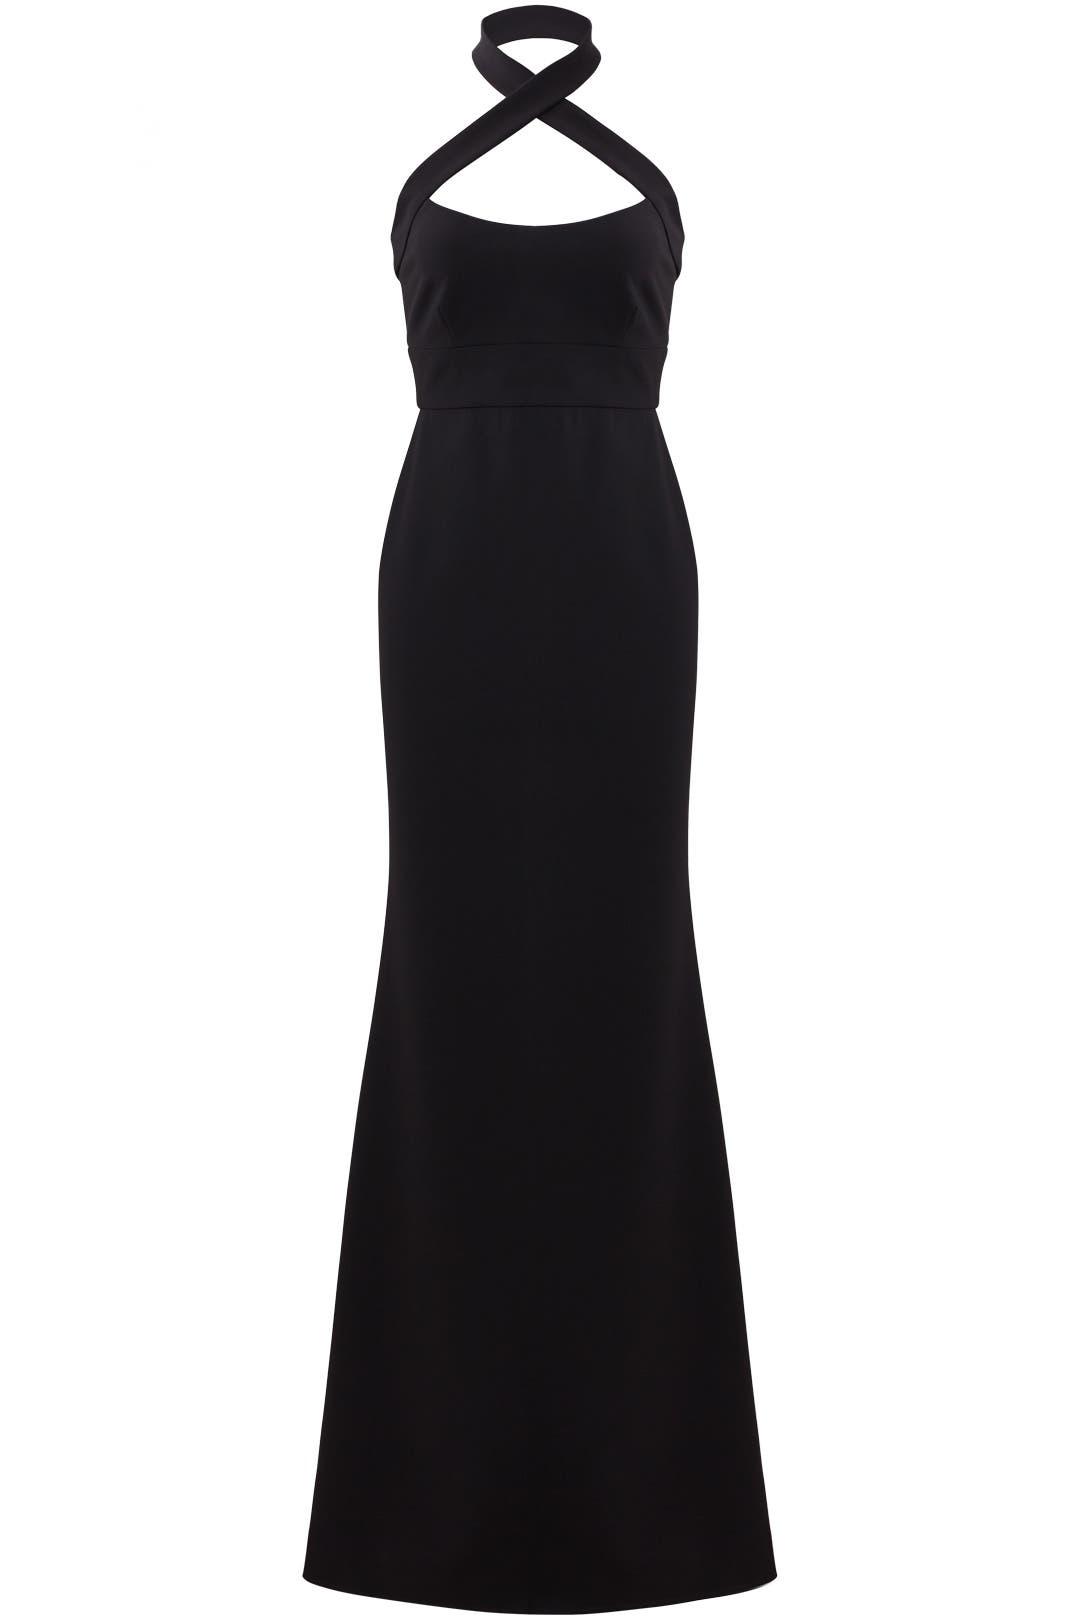 Black Halter Gown by Jill Jill Stuart for $100 - $110 | Rent the Runway